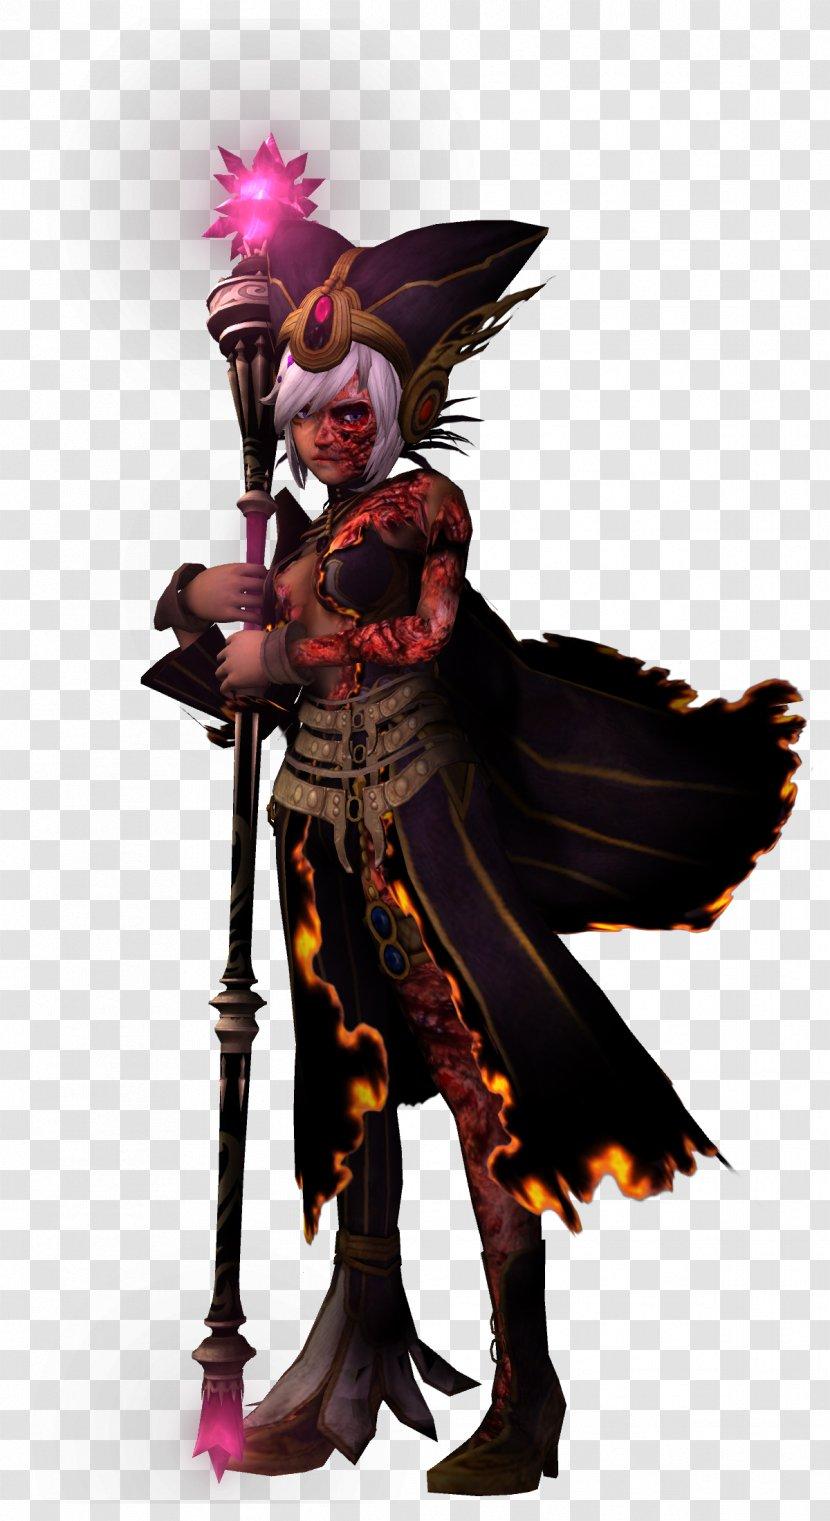 Ganon Universe Of The Legend Zelda Hyrule Warriors Gerudo Hylian Wiki Xenoblade Chronicles Transparent Png